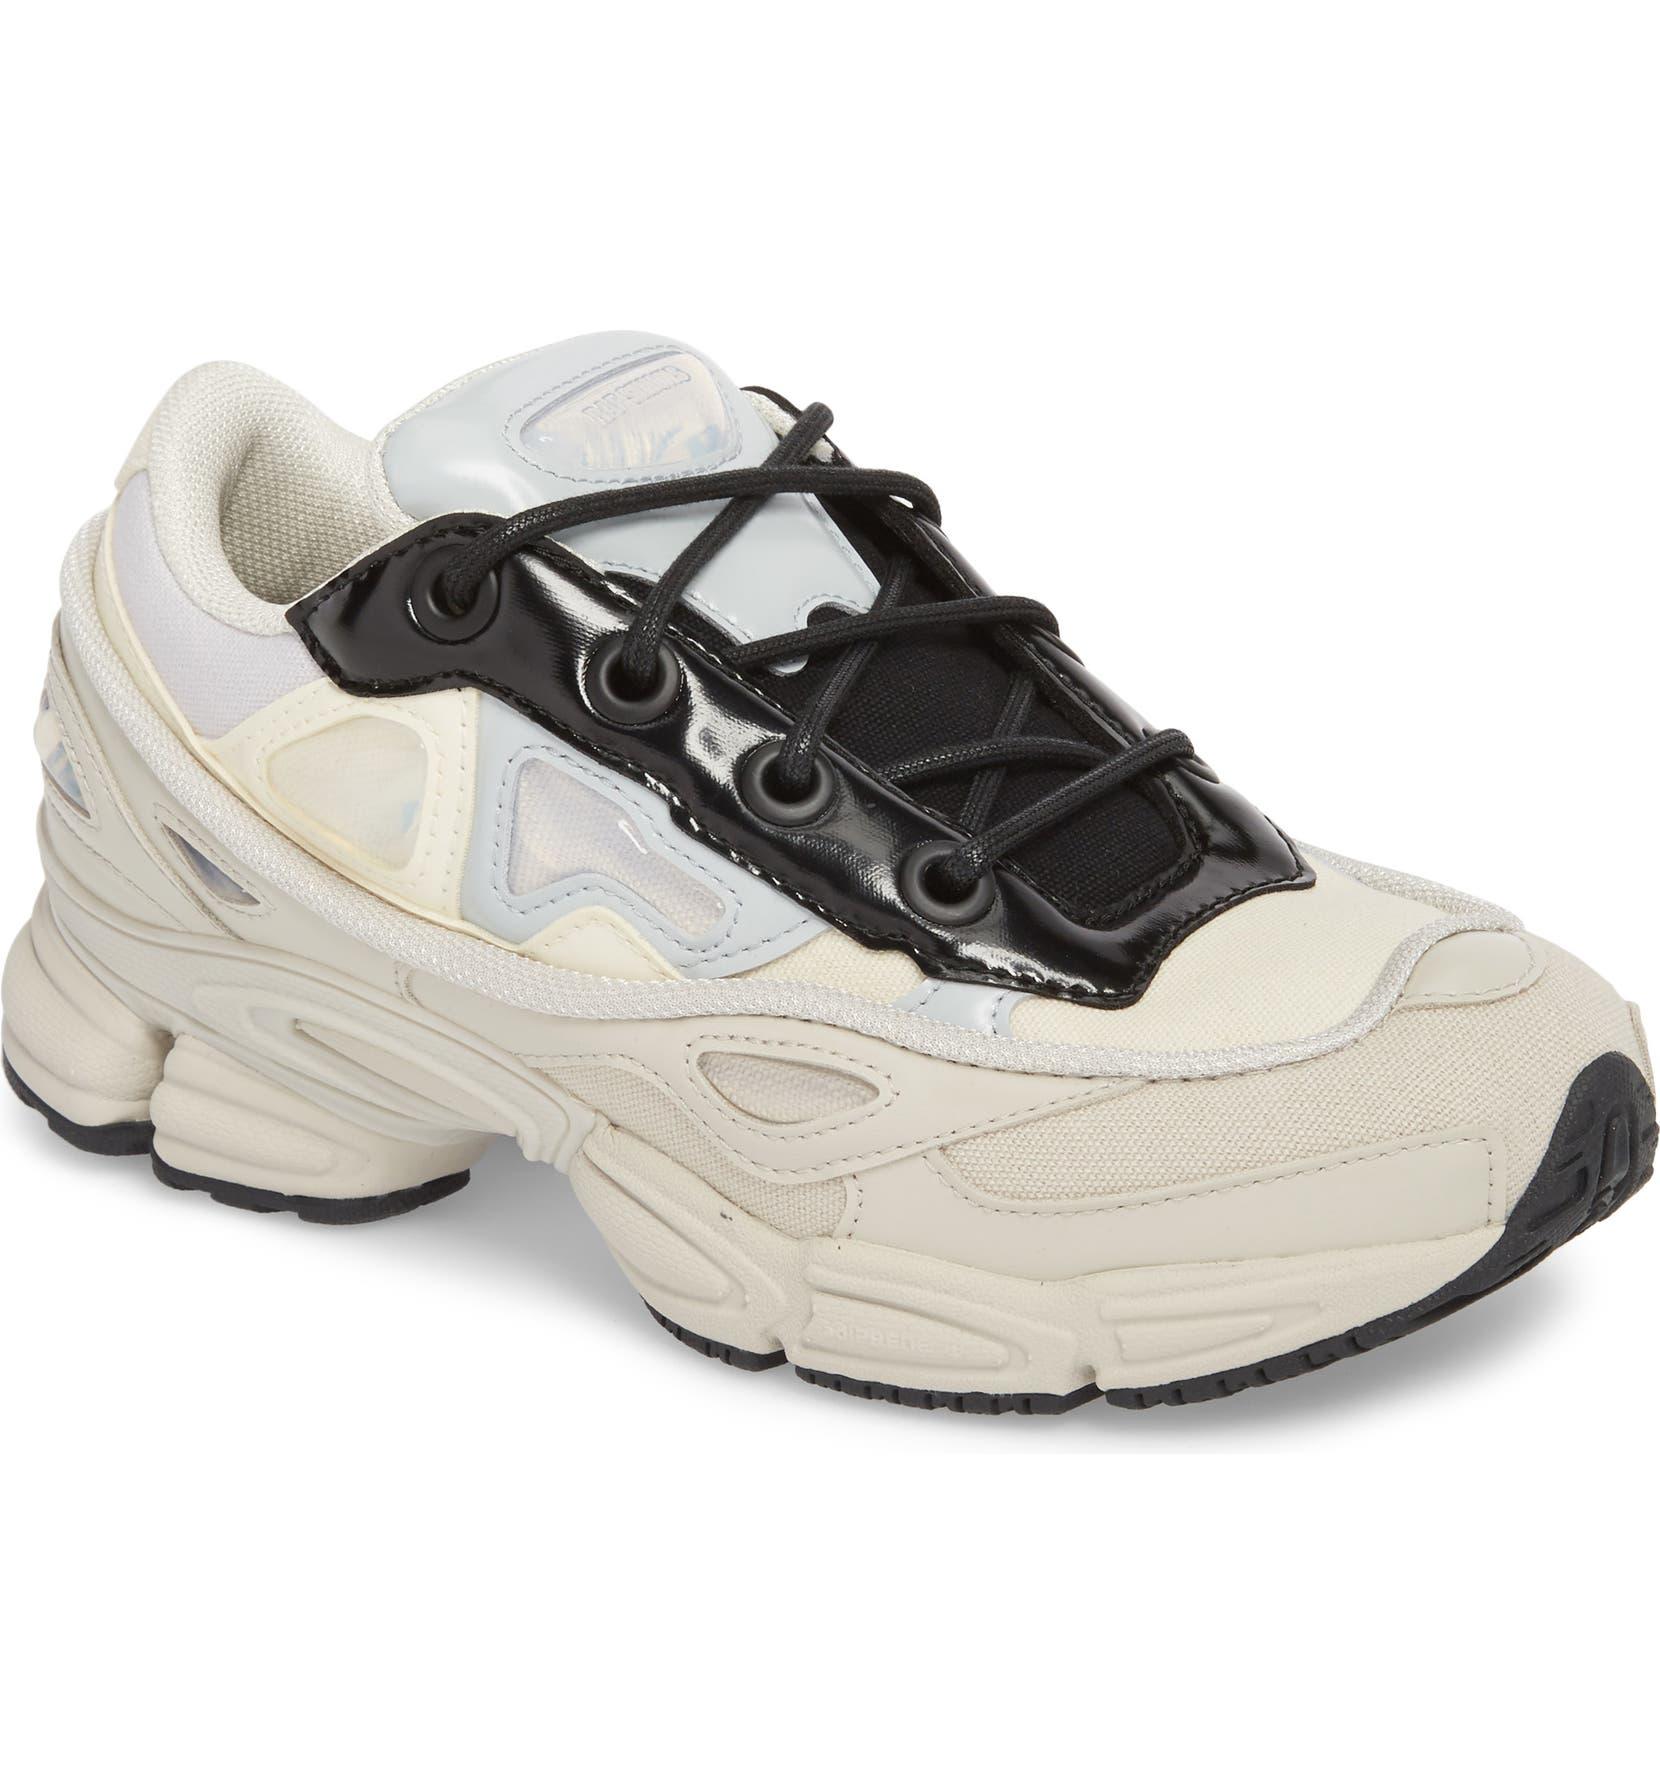 adidas by Raf Simons Ozweego III Sneaker (Women)   Nordstrom